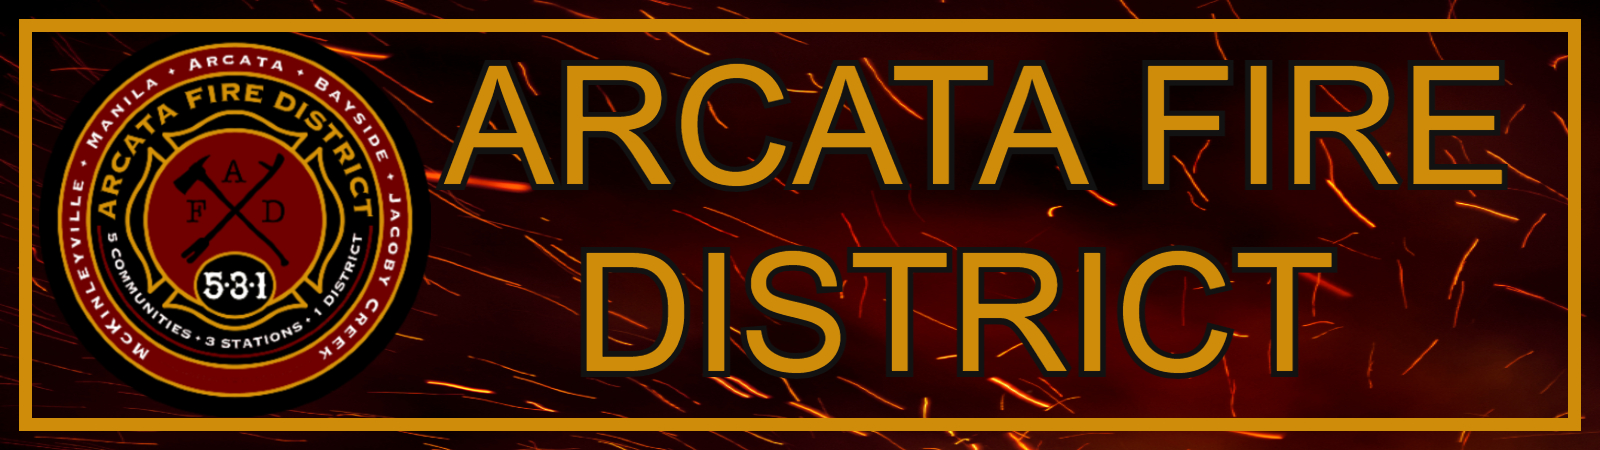 Arcata Fire District